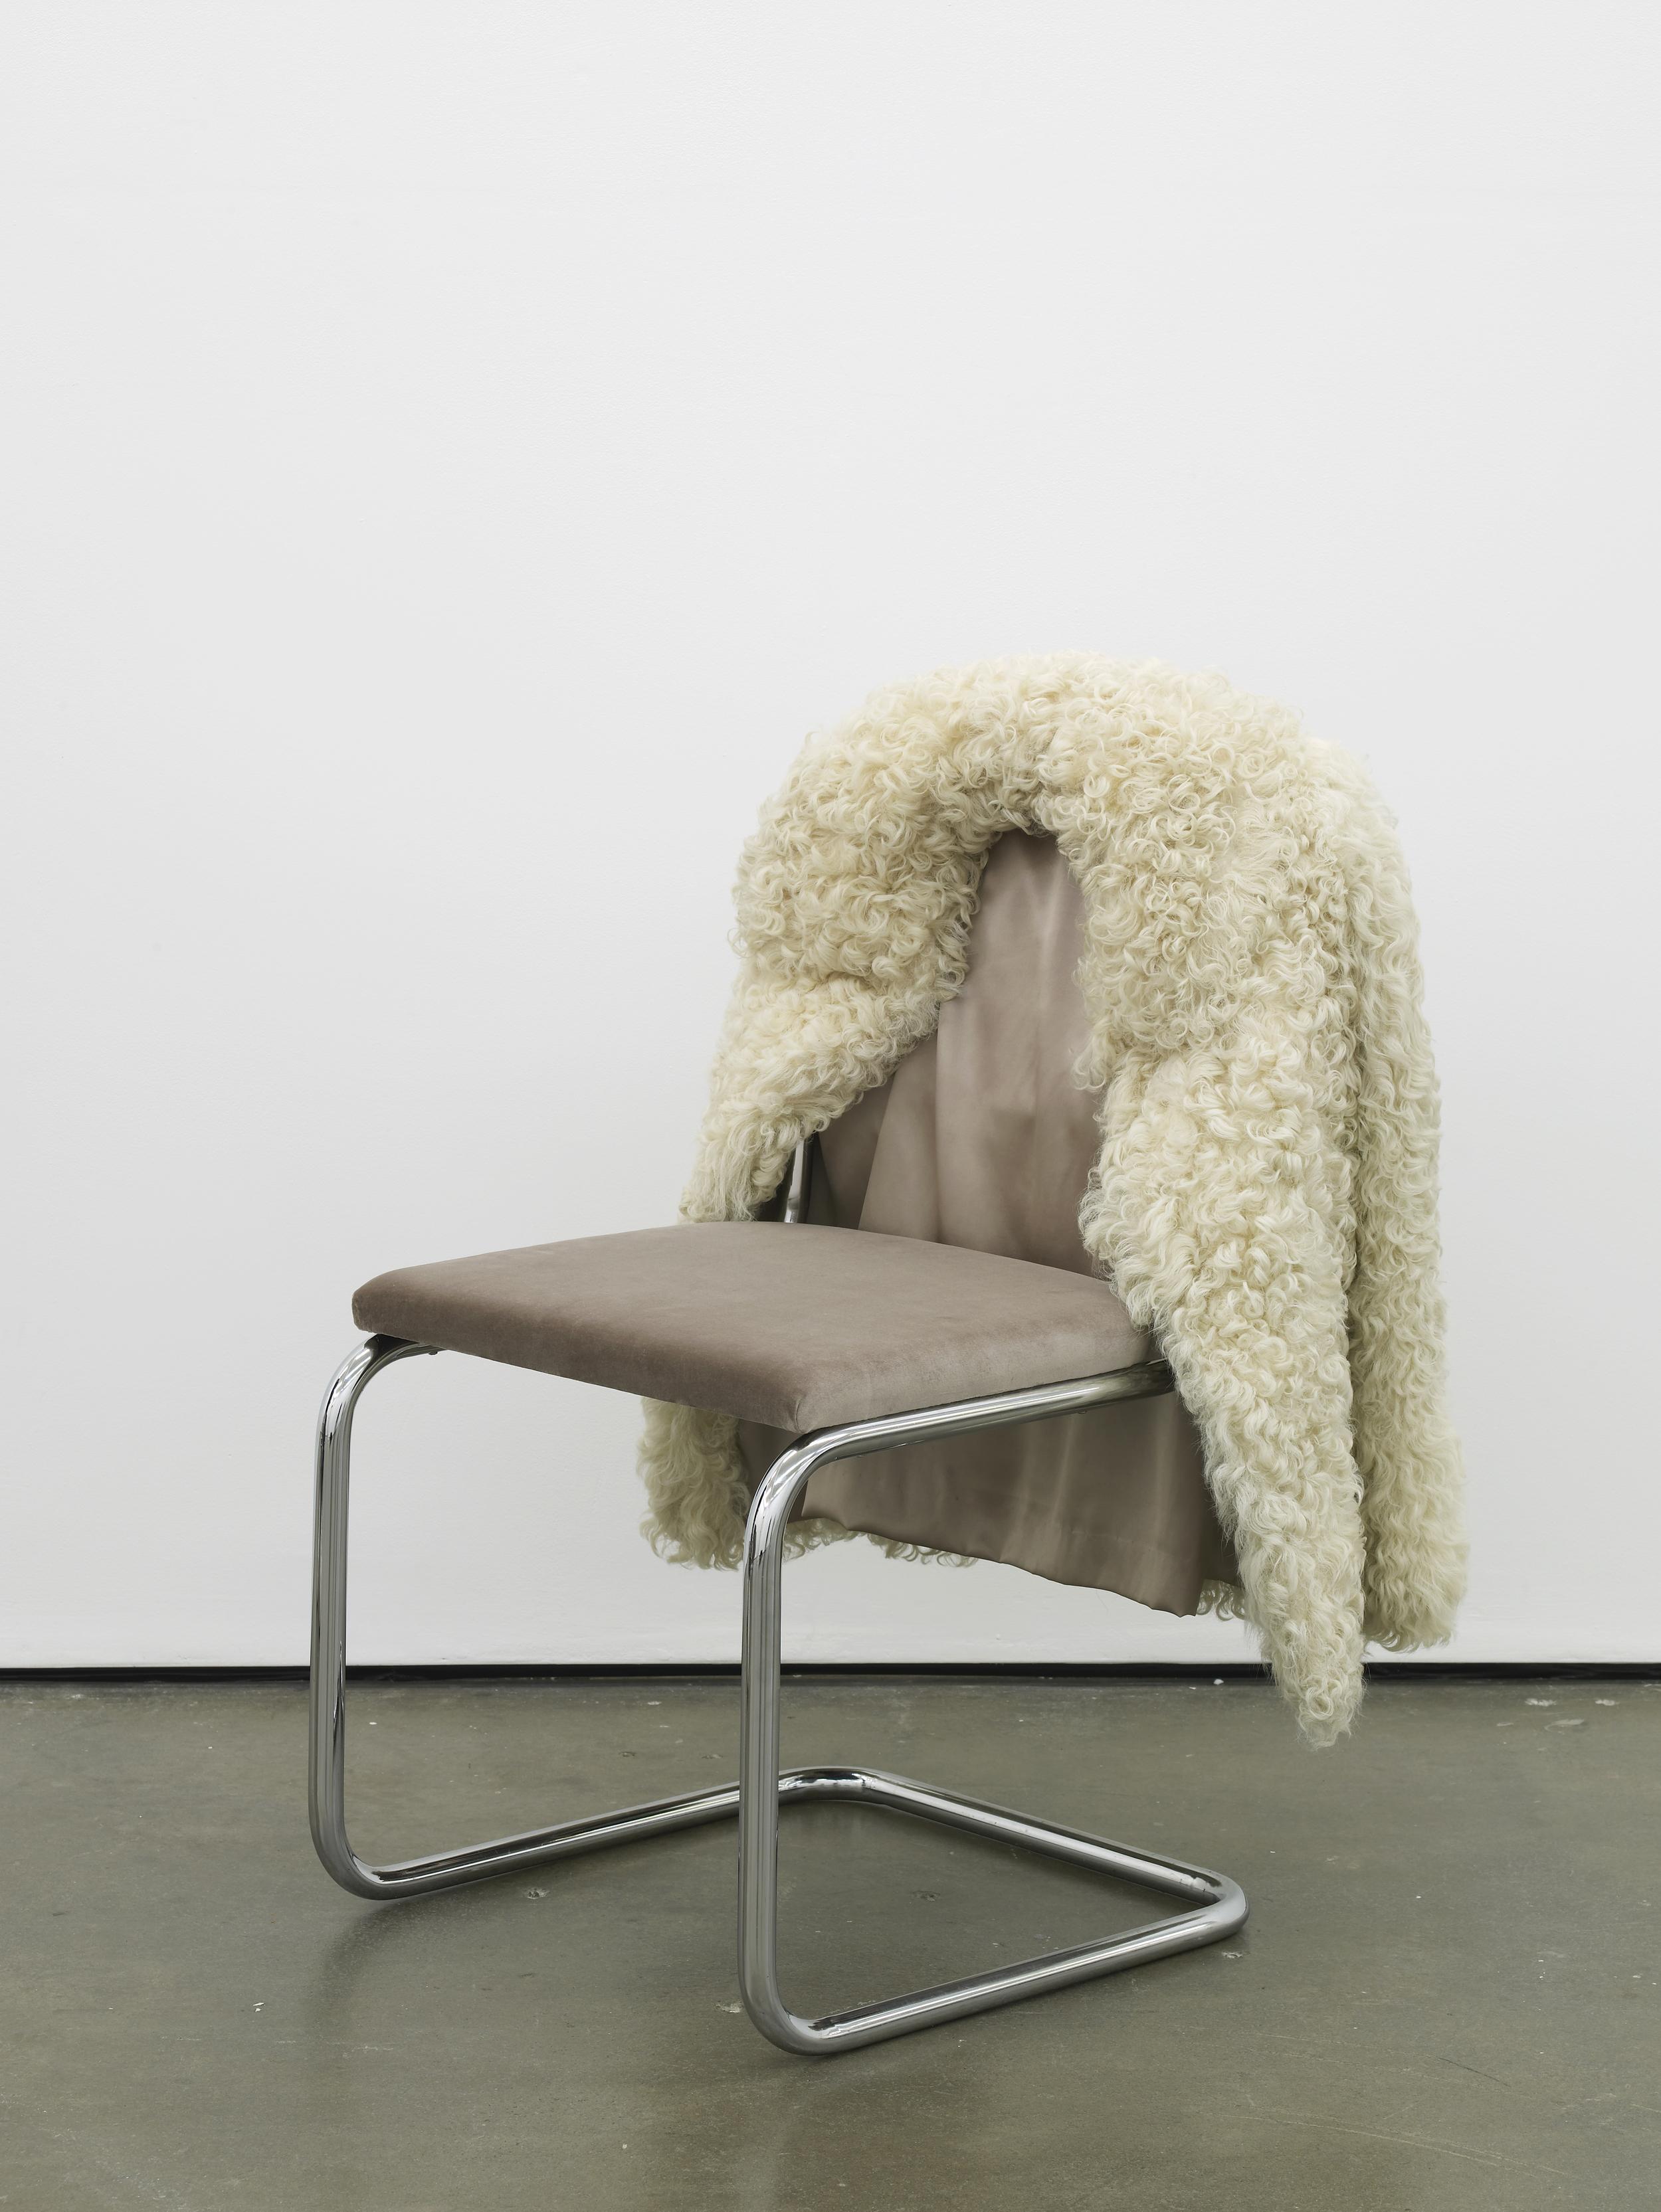 Untitled Chair - AL-0      2015 Vintage fur, steel tubing, upholstery, silk and velvet 85 x 65 x 60 cm / 33.4 x 25.5 x 23.6 in